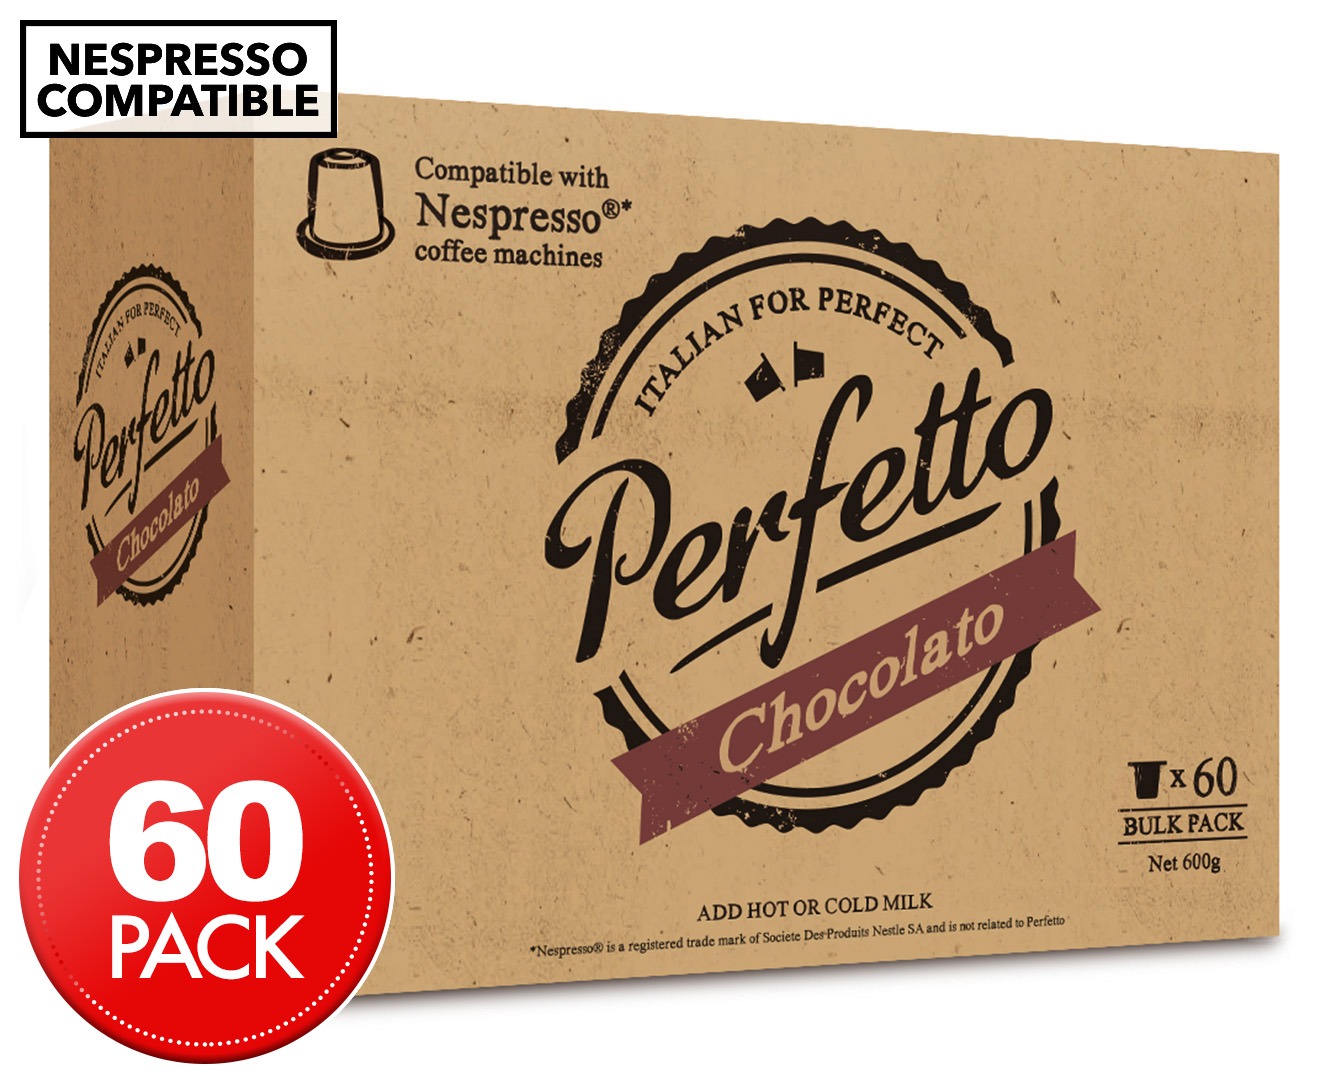 perfetto nespresso compatible hot chocolate capsules 60pk ebay. Black Bedroom Furniture Sets. Home Design Ideas